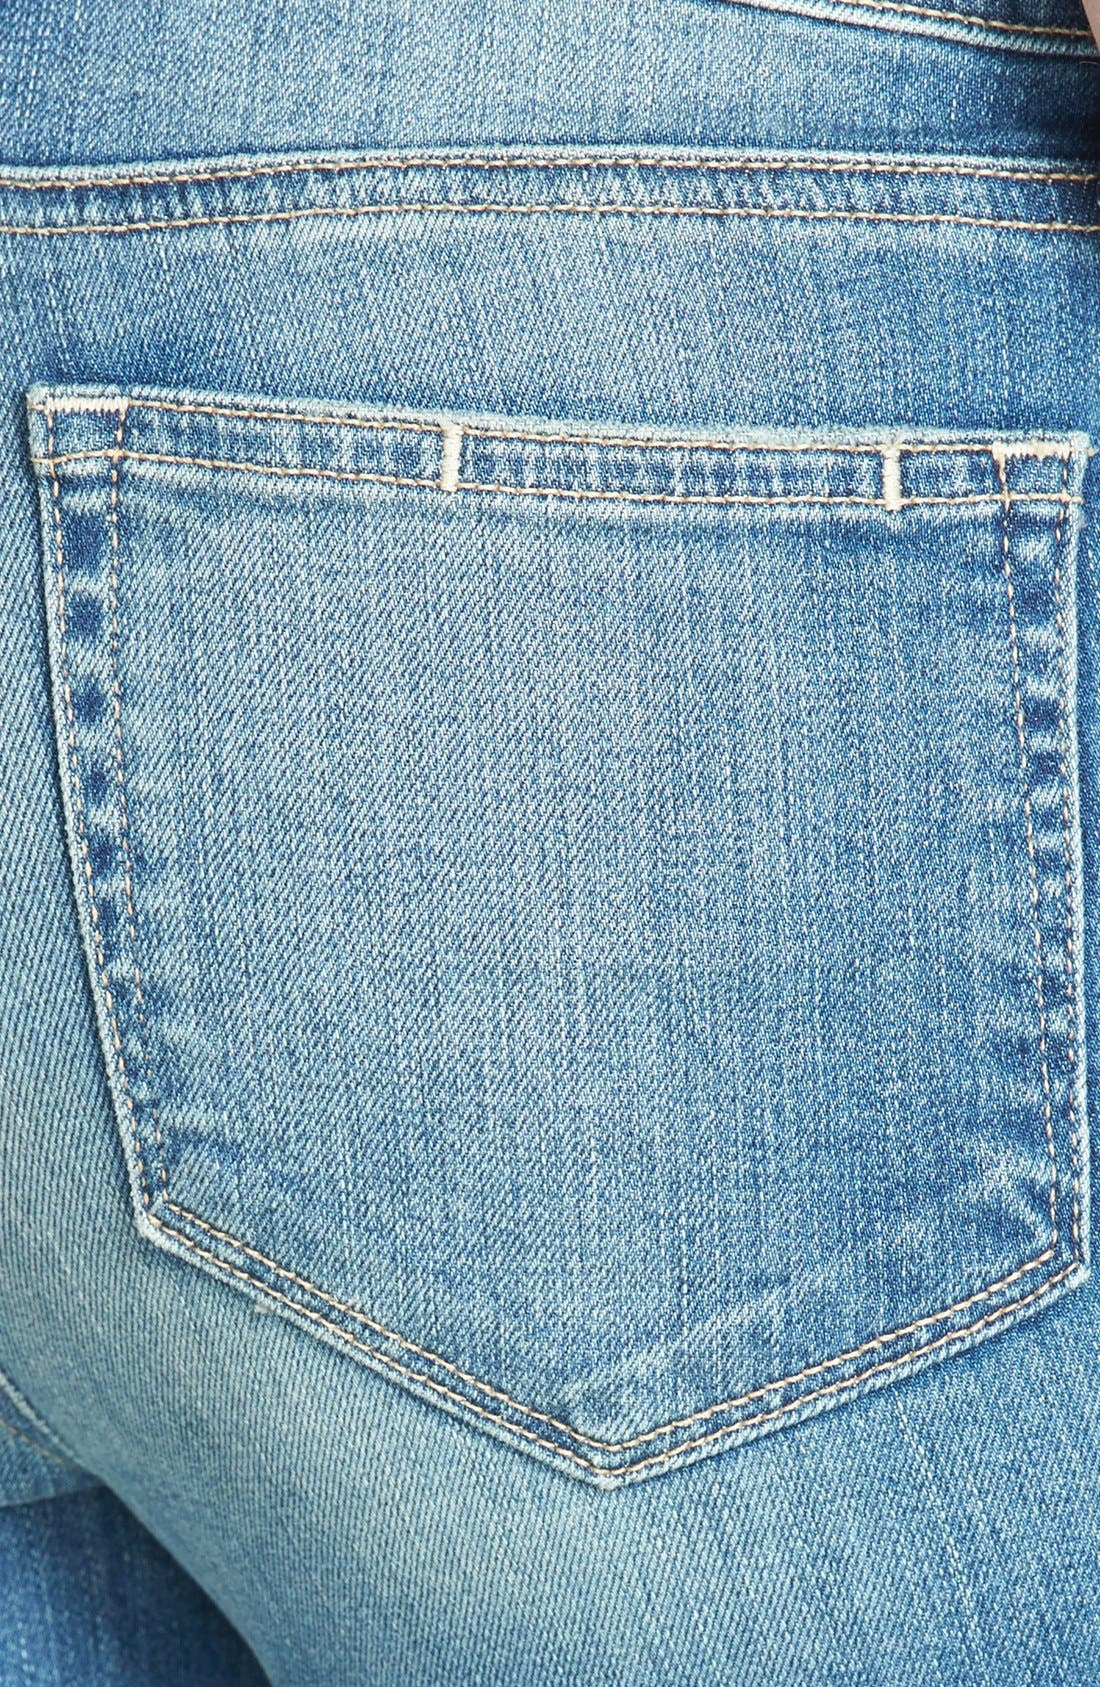 Alternate Image 3  - Paige Denim 'Hoxton' Distressed High Rise Crop Jeans